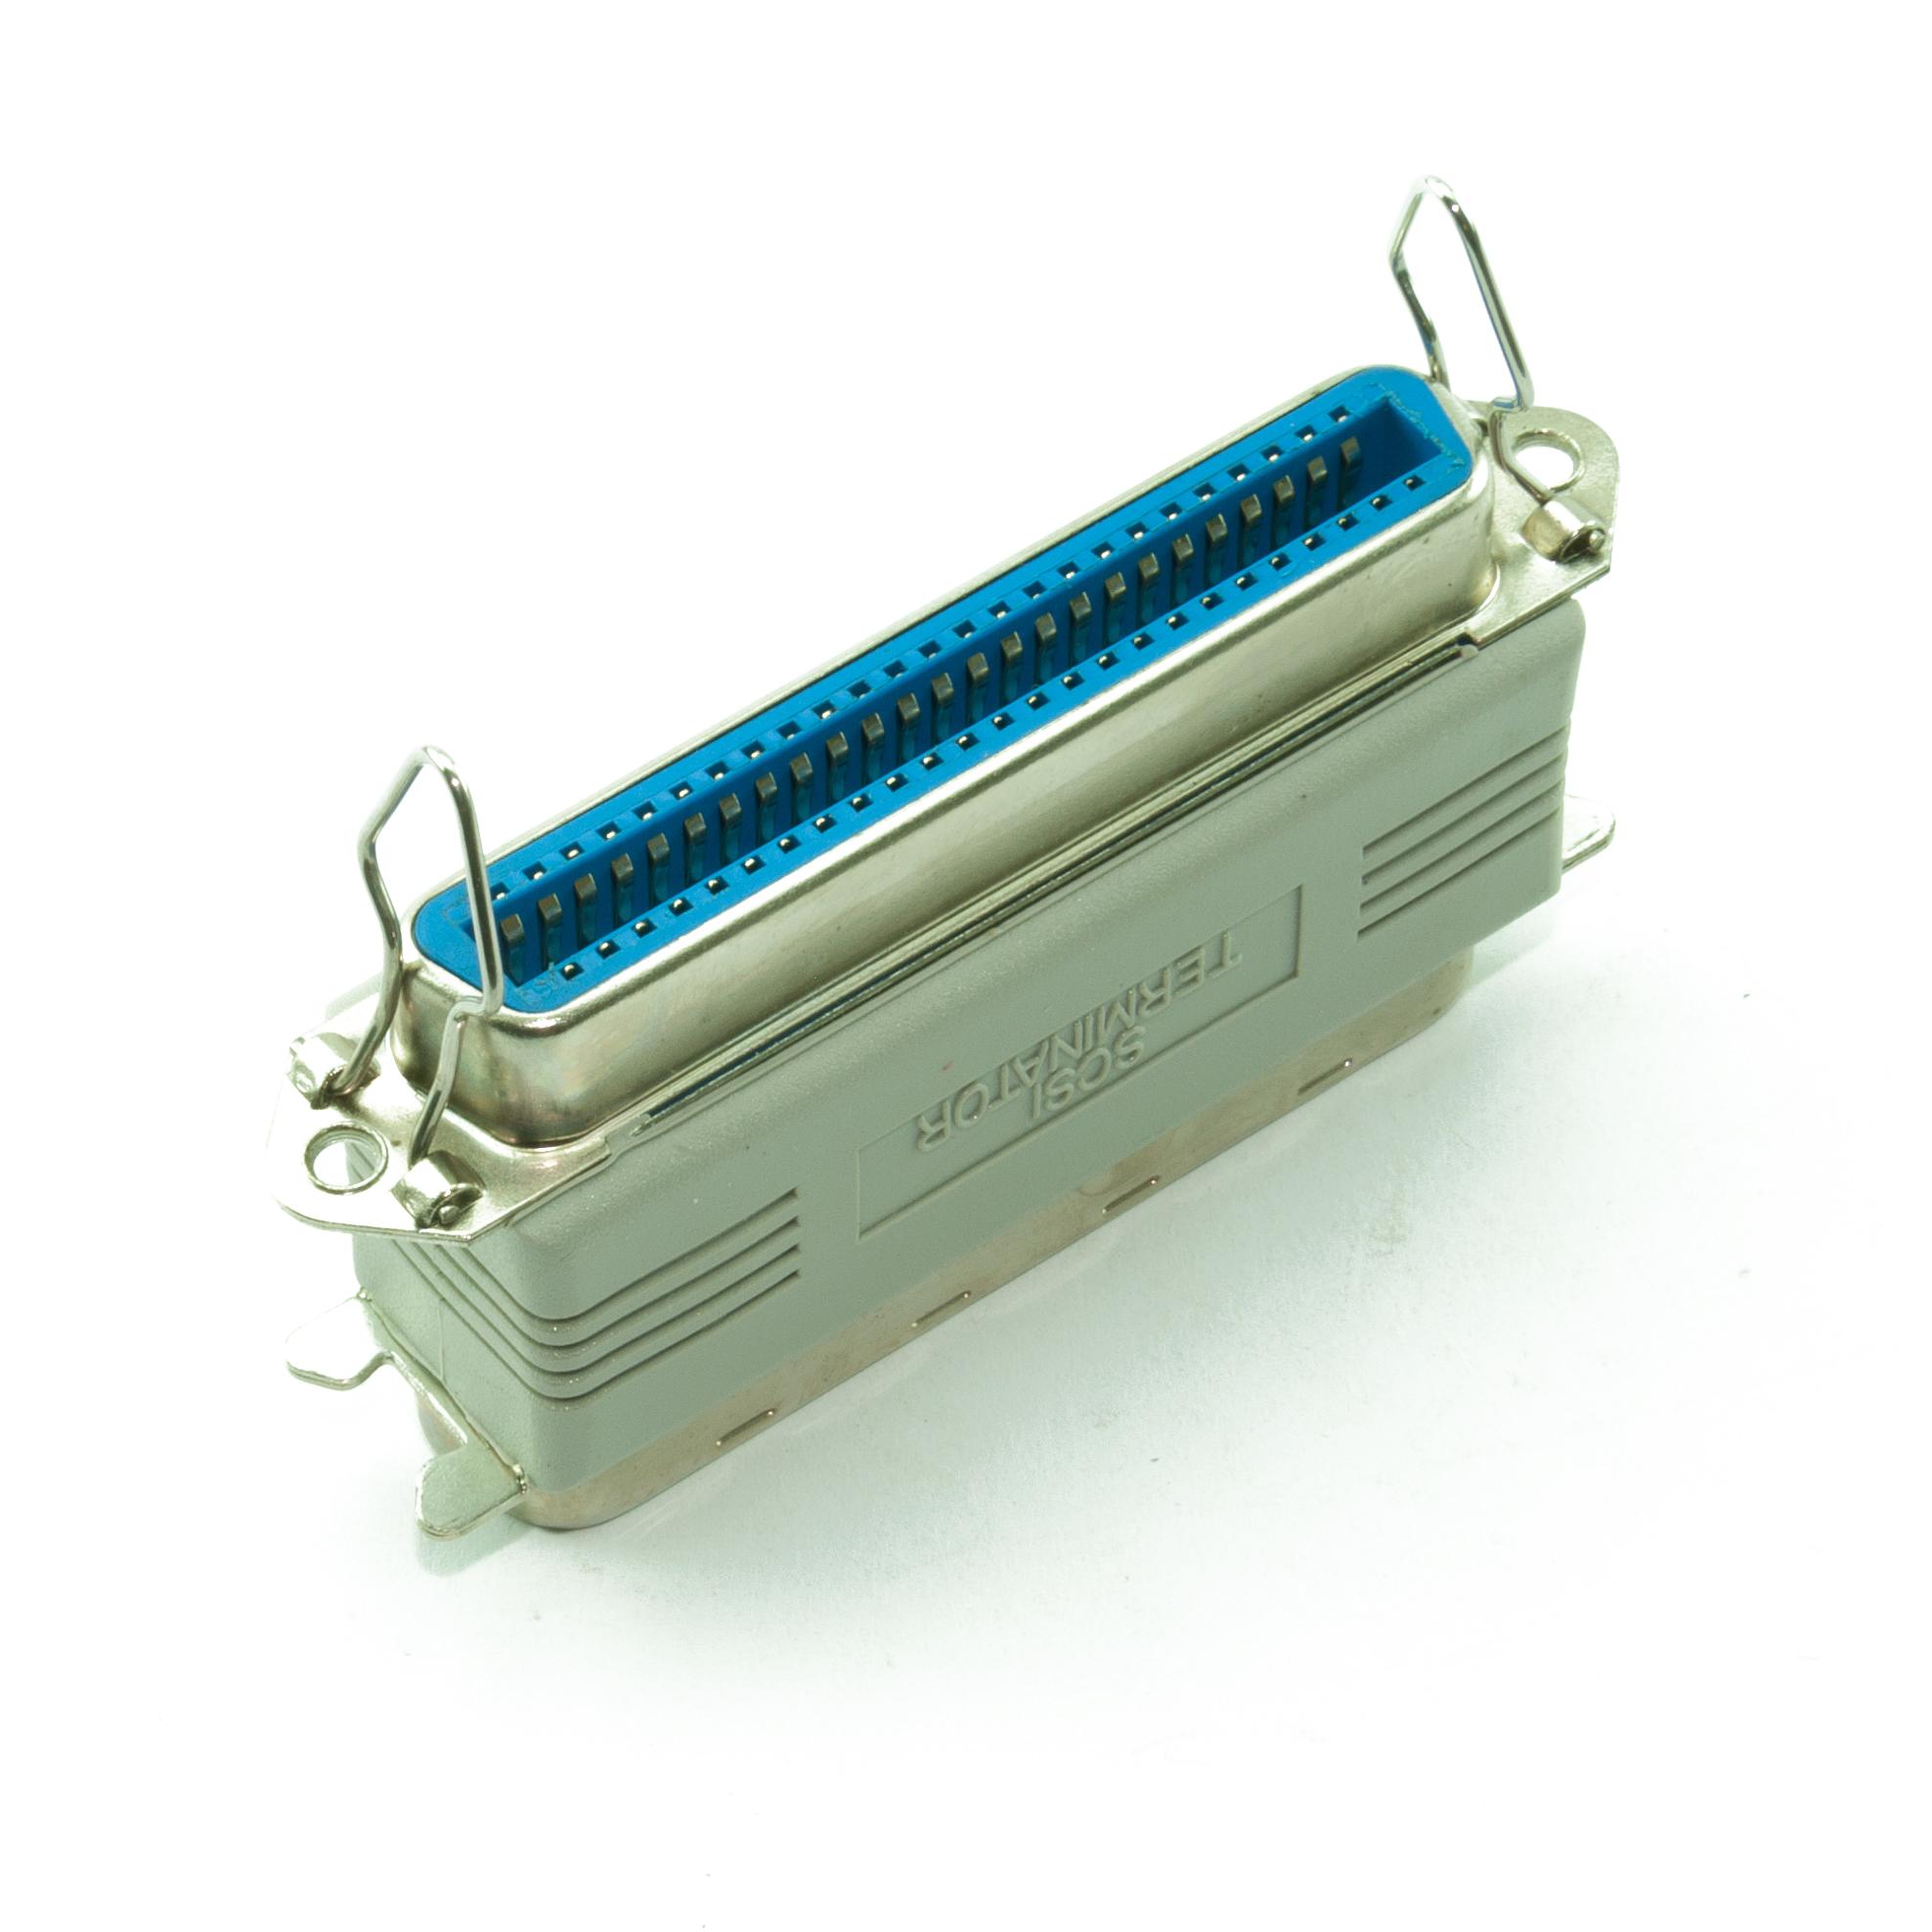 FEMALE PASS THROUGH PASSIVE SCSI TERMINATOR 50 PIN CENTRONICS MALE